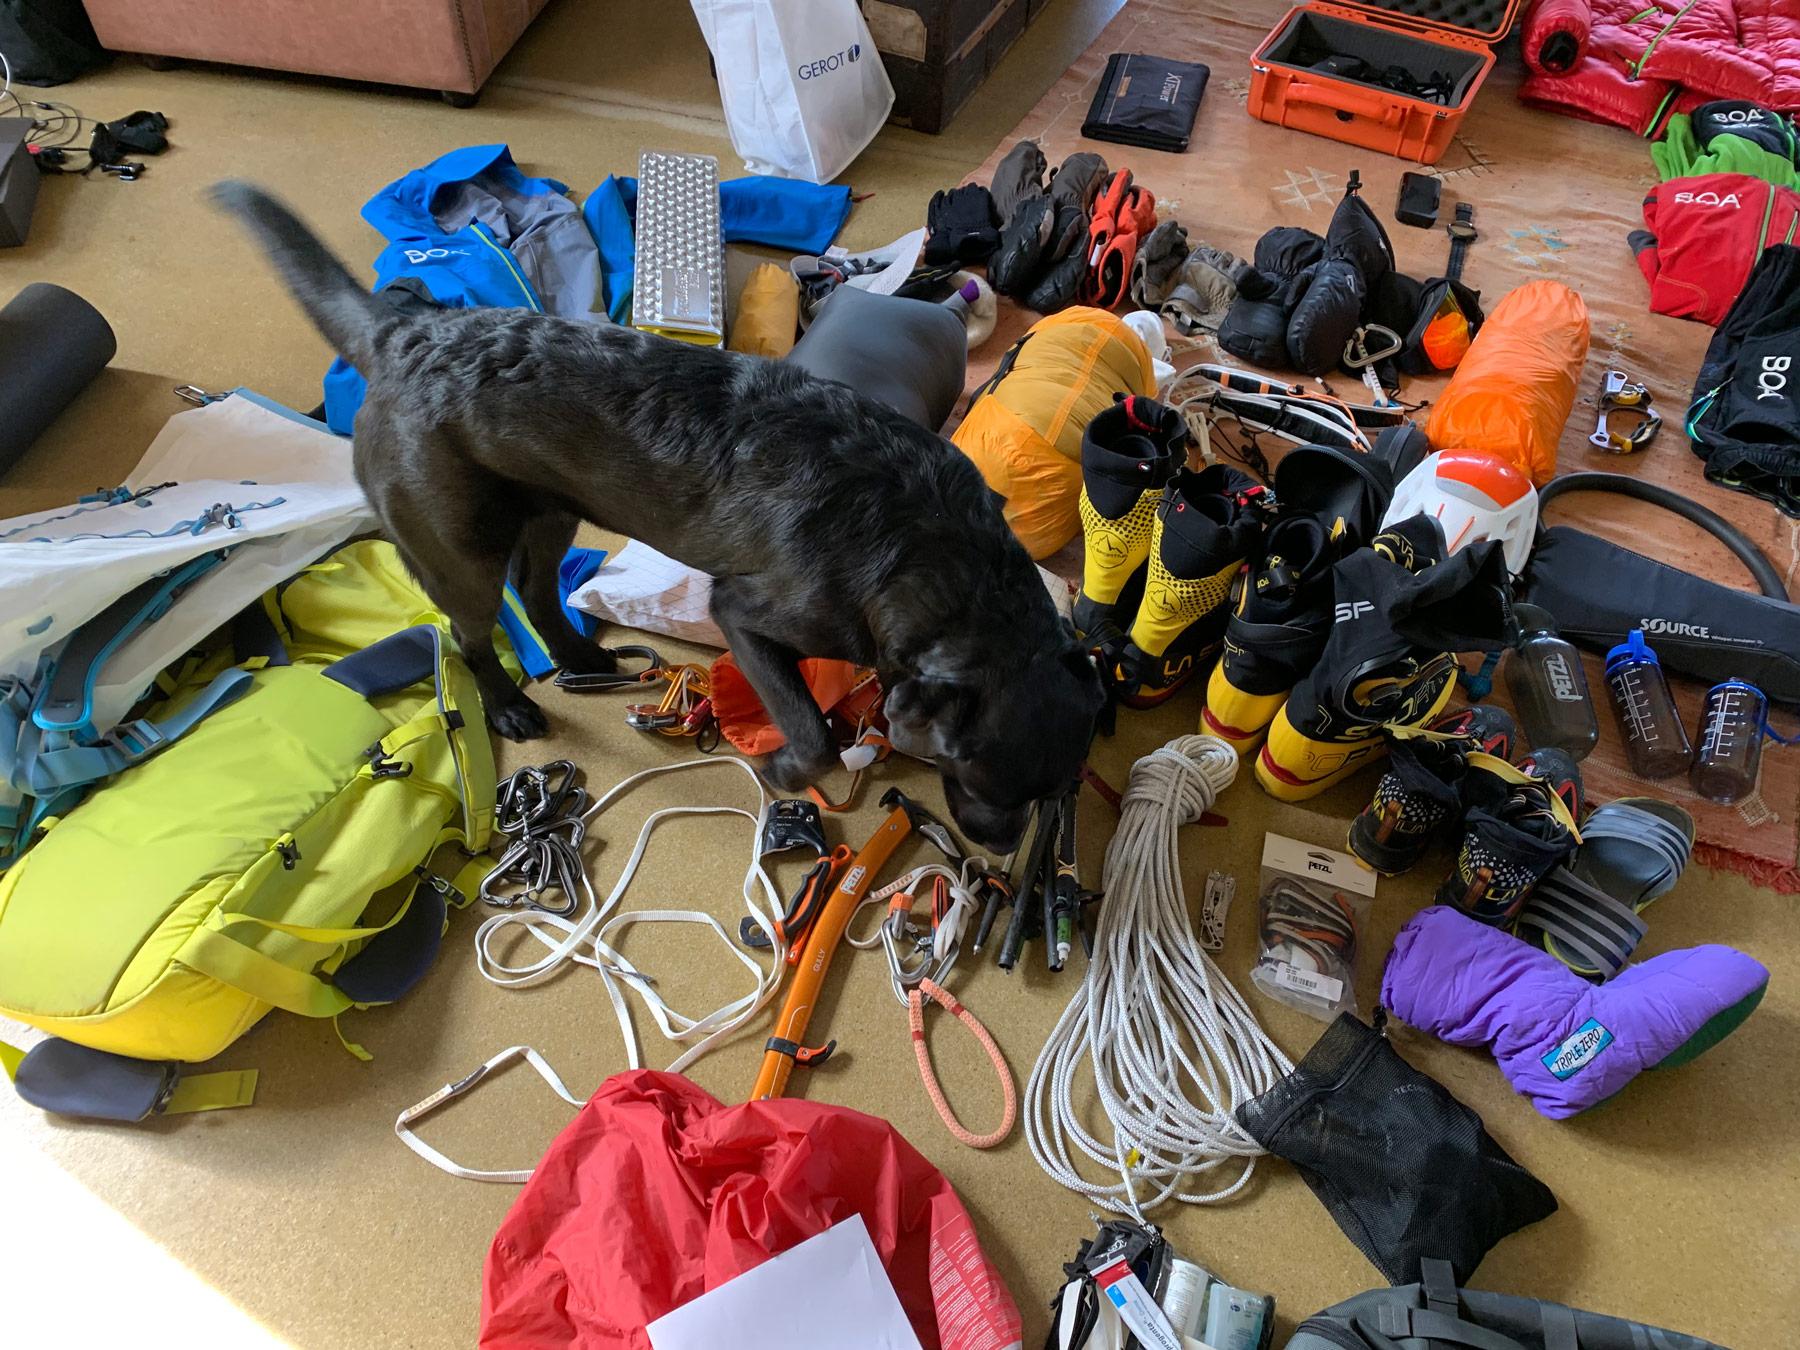 Kompetente Unterstützung beim Packen, Max Berger I bergundsteigen.blog